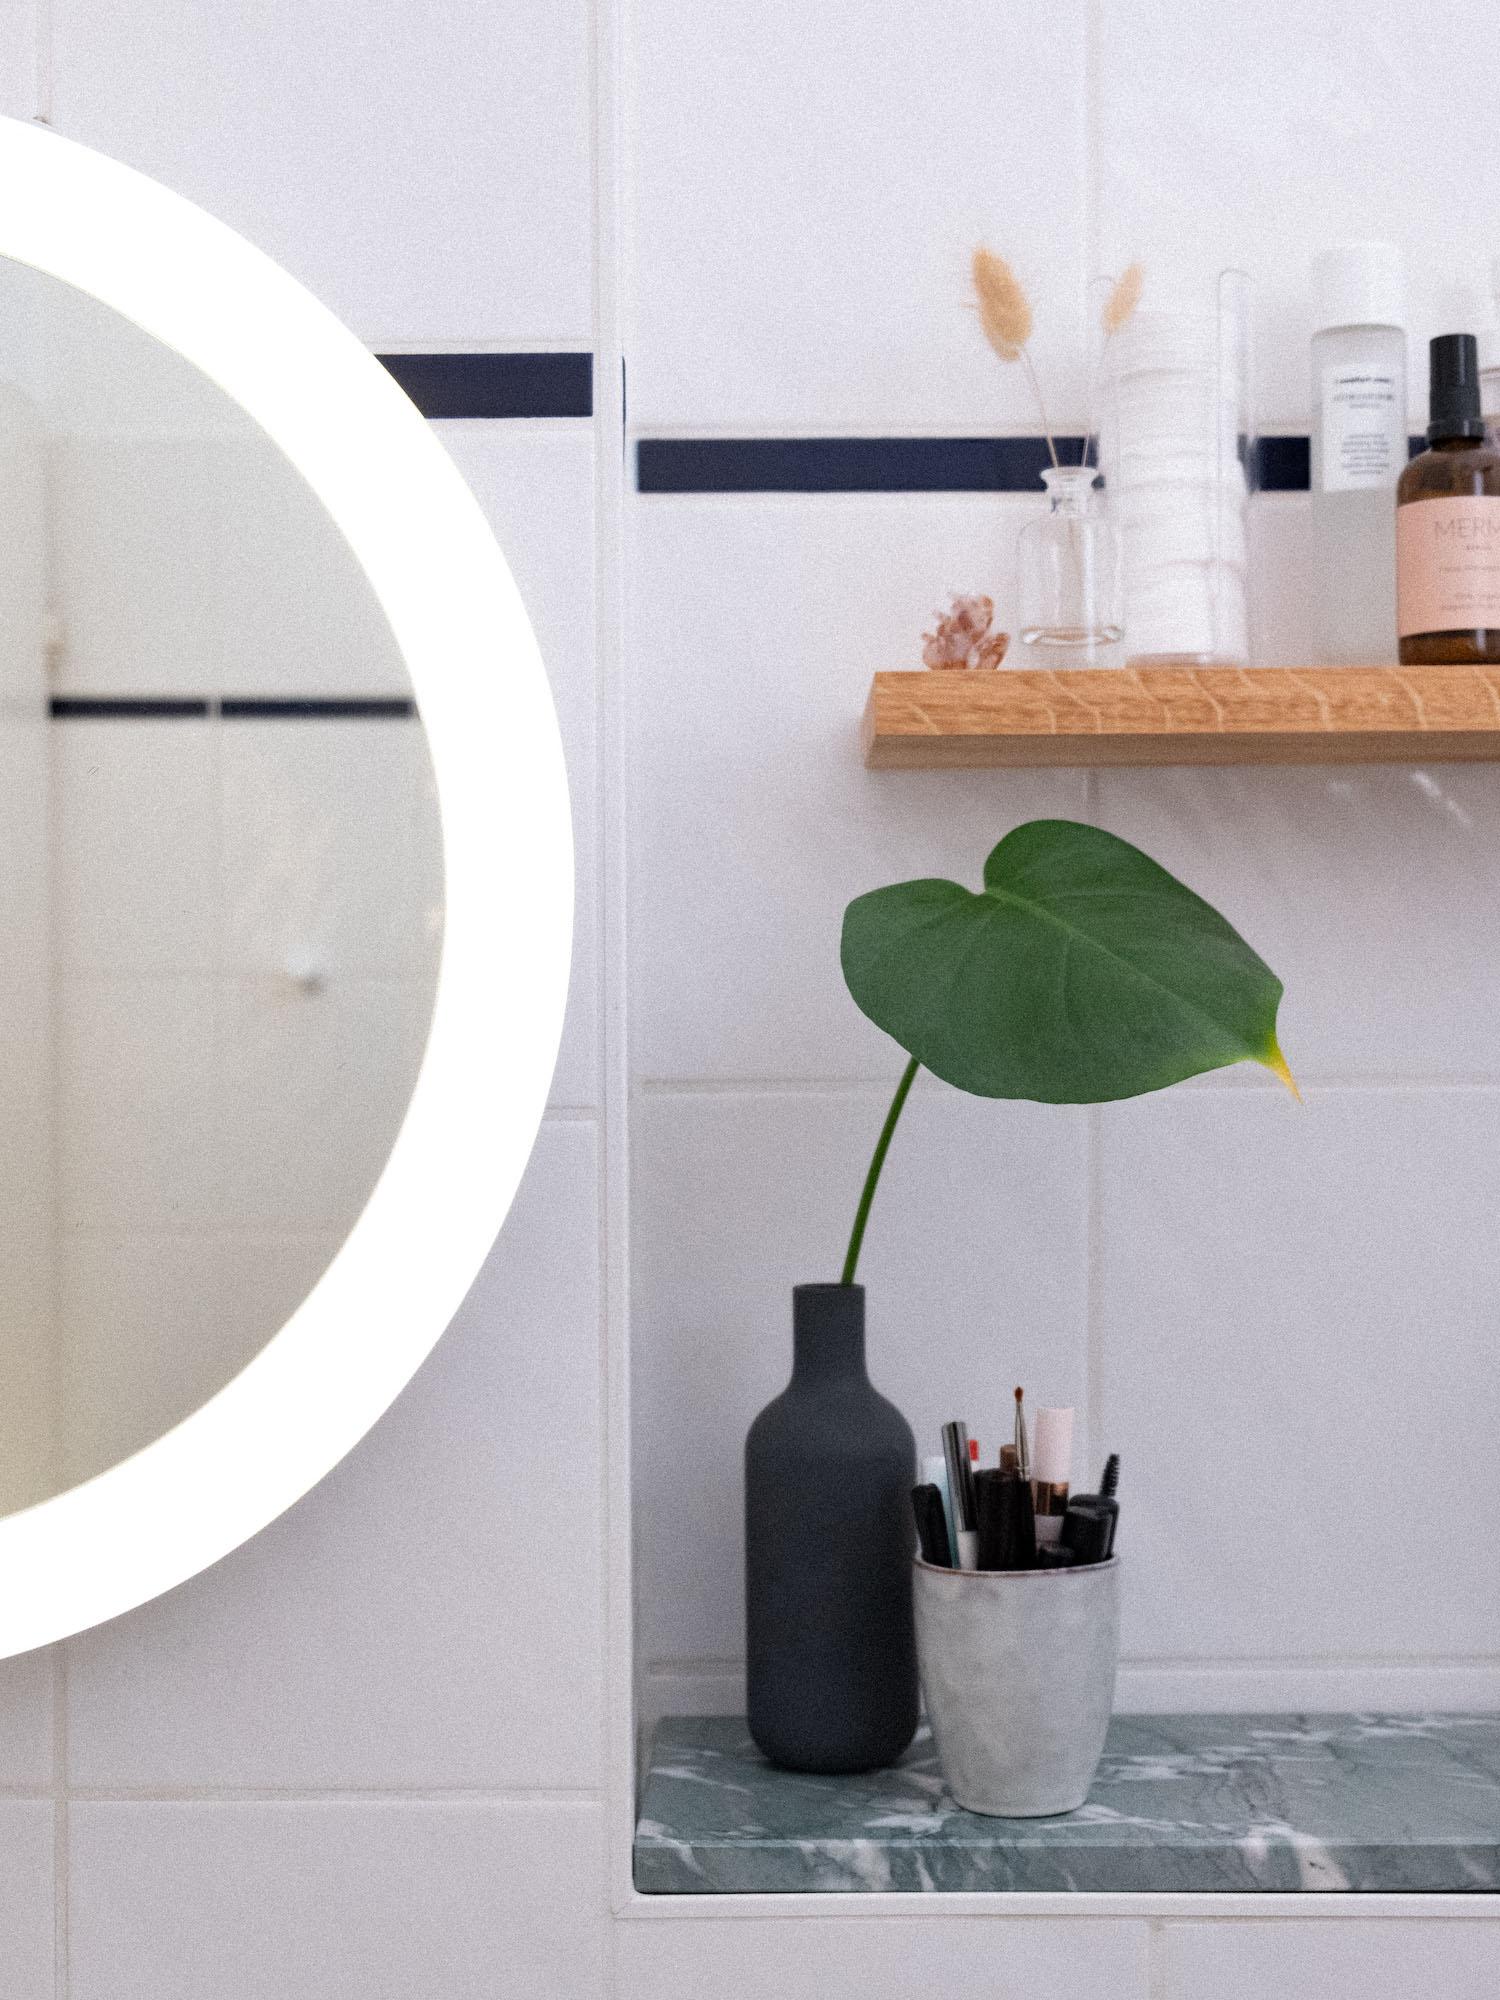 Beautyblog Bare Minds Makeover mit Philips Hue Spiegelleuchte